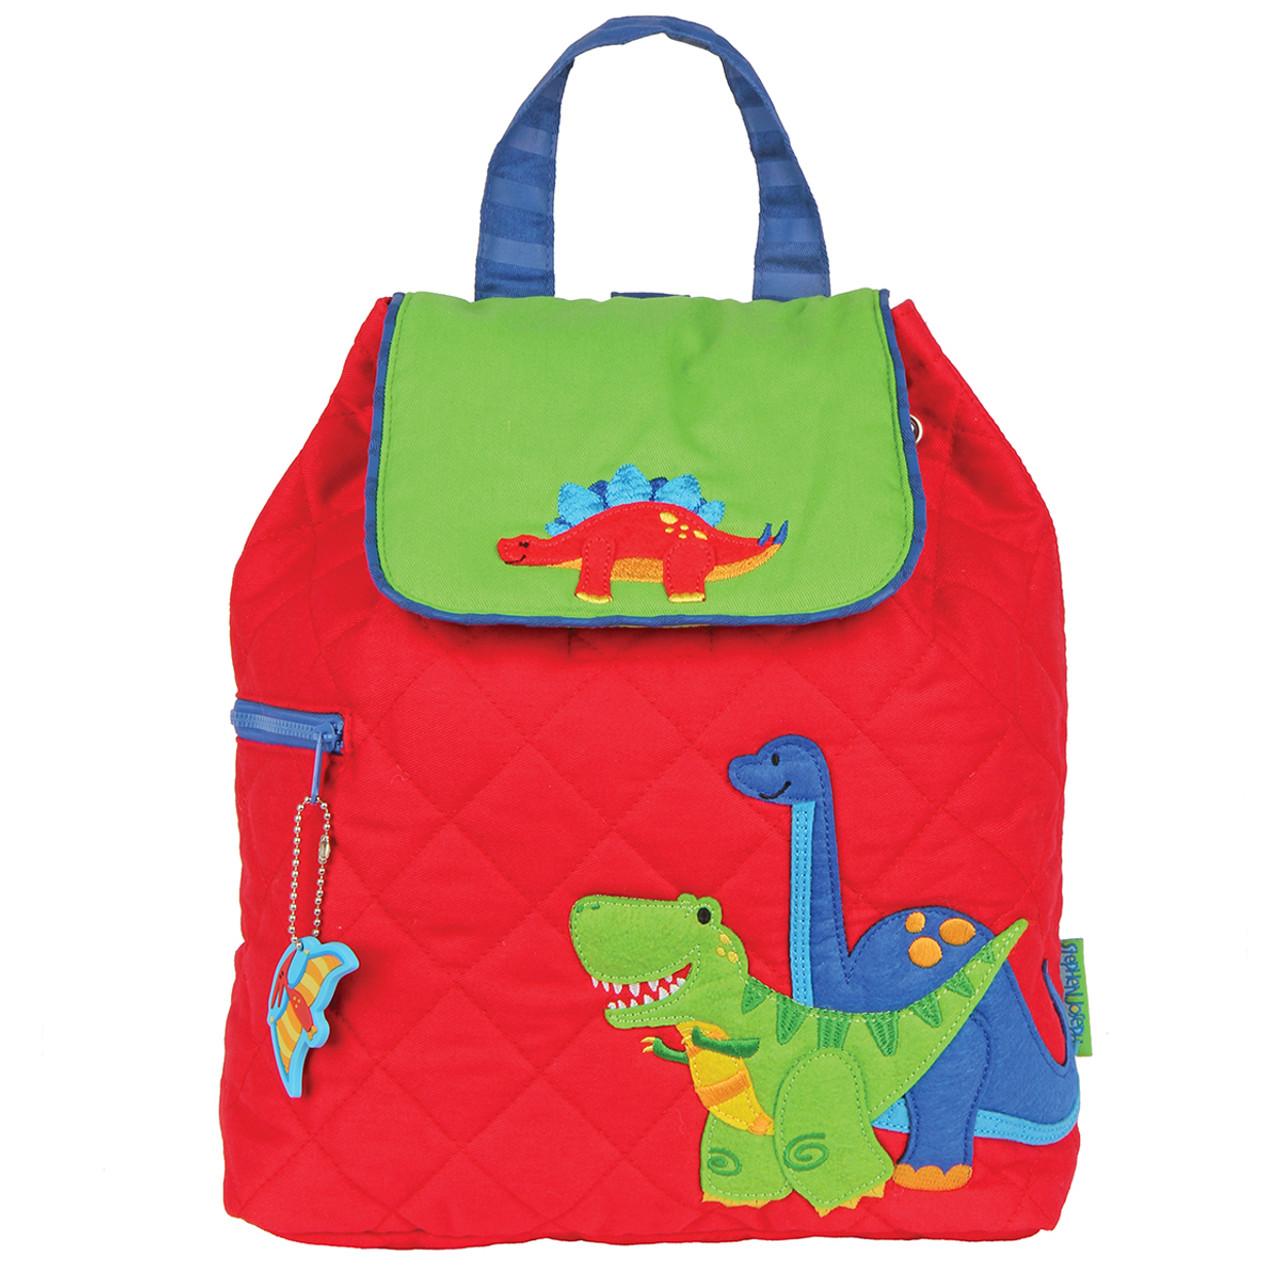 Childrens Backpacks - Stephen Joseph Quilted